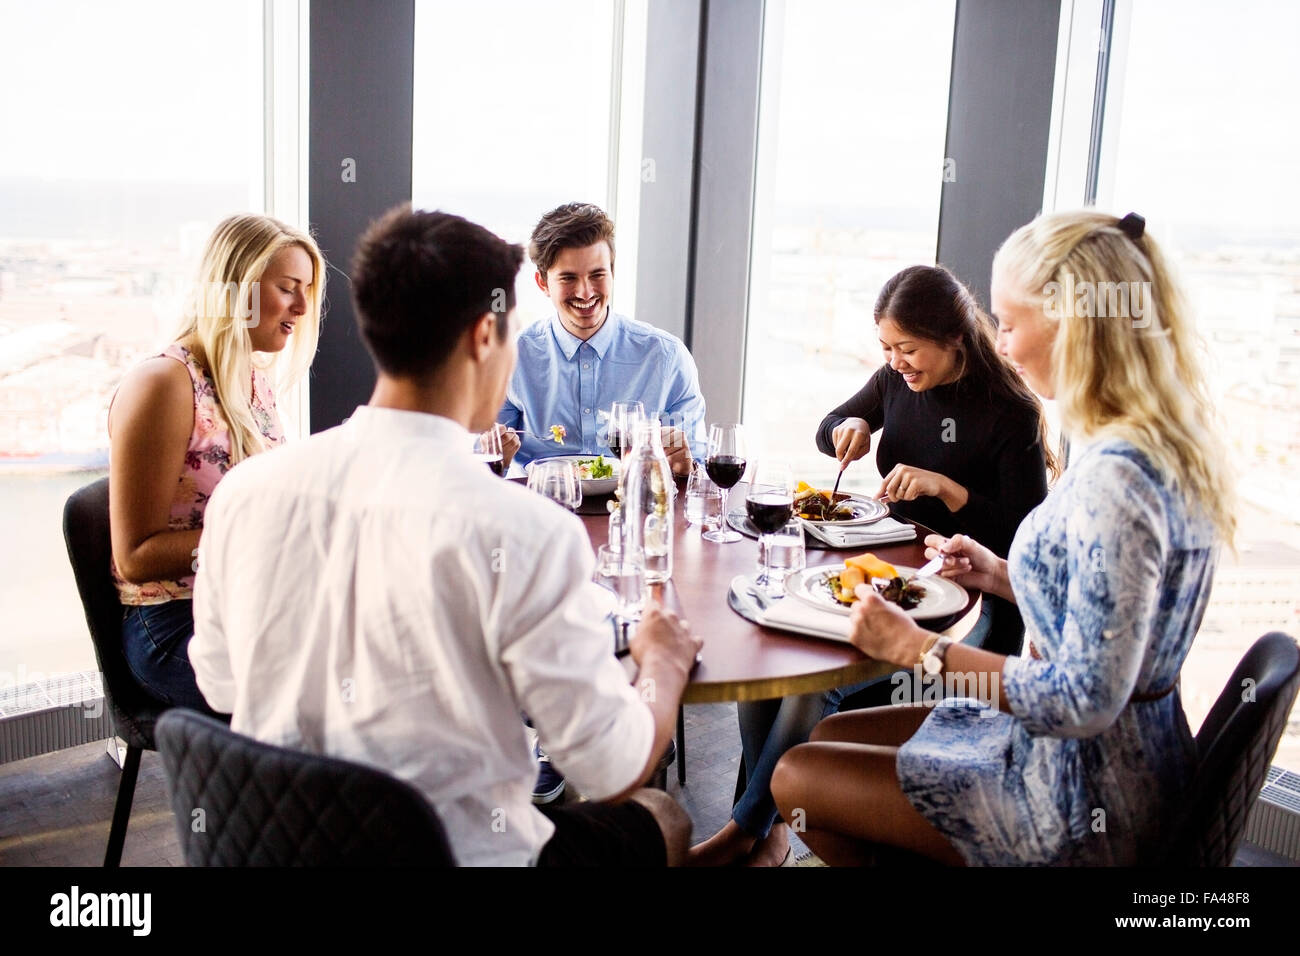 Happy friends having meal at Sky bar restaurant - Stock Image